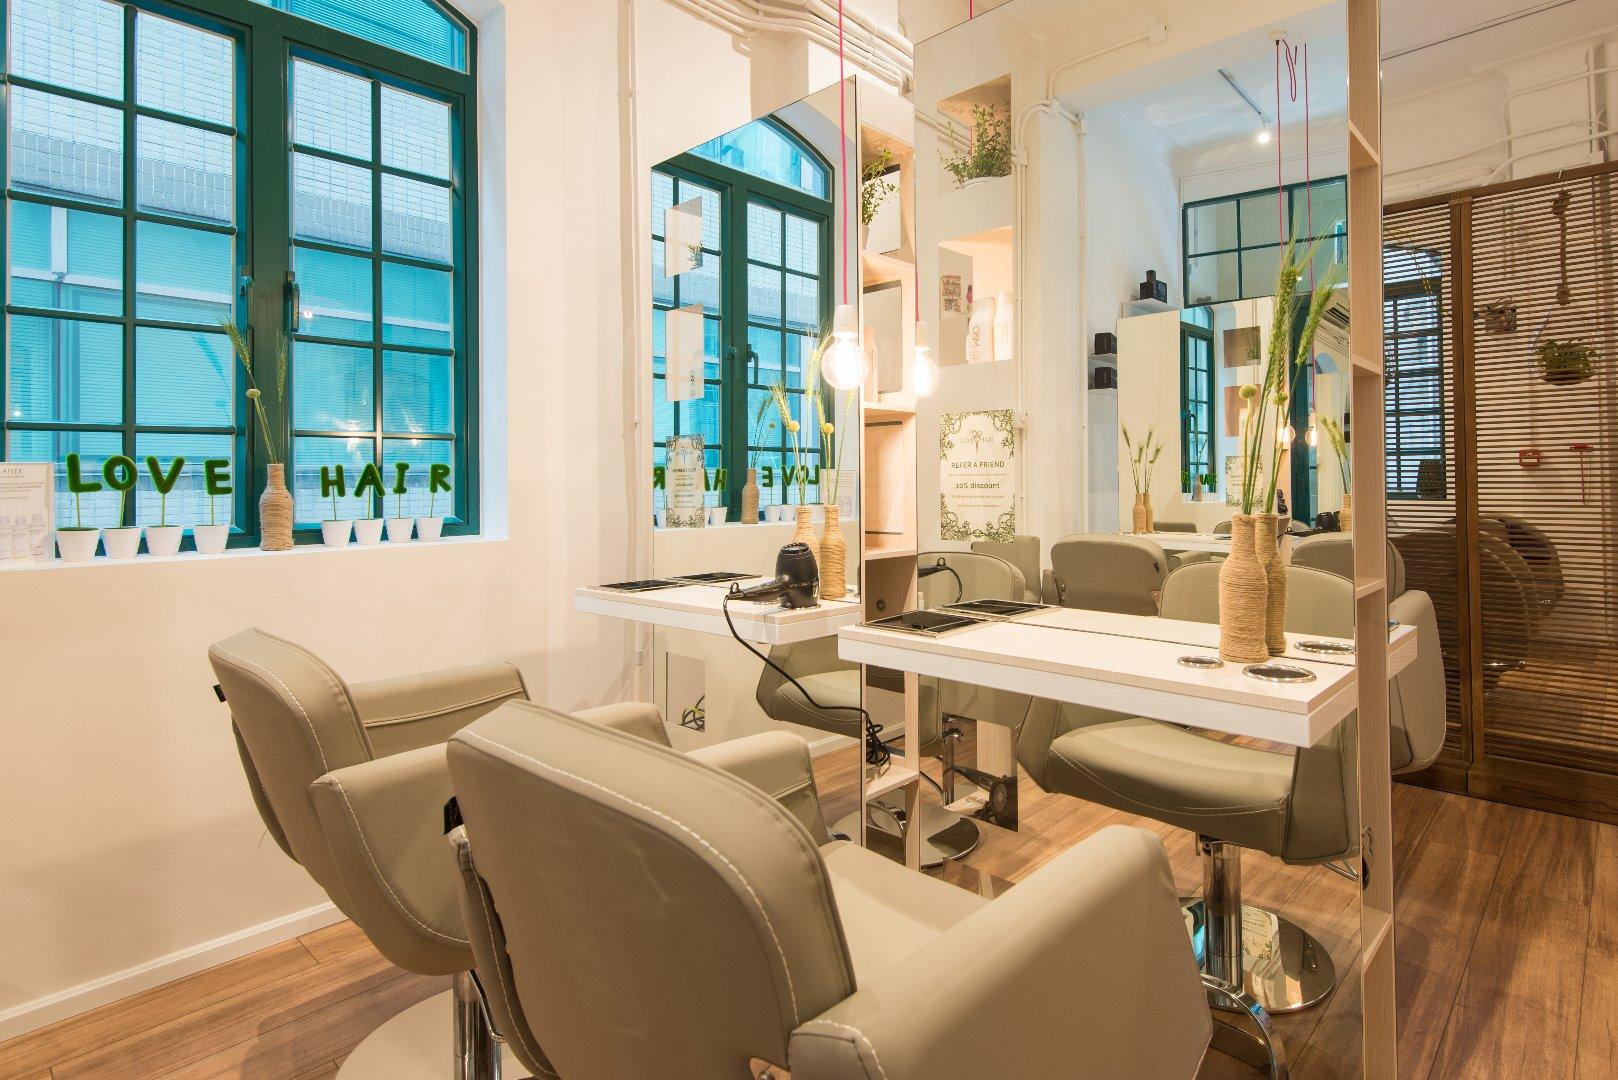 Love Hair : the most eco-friendly salon boutique